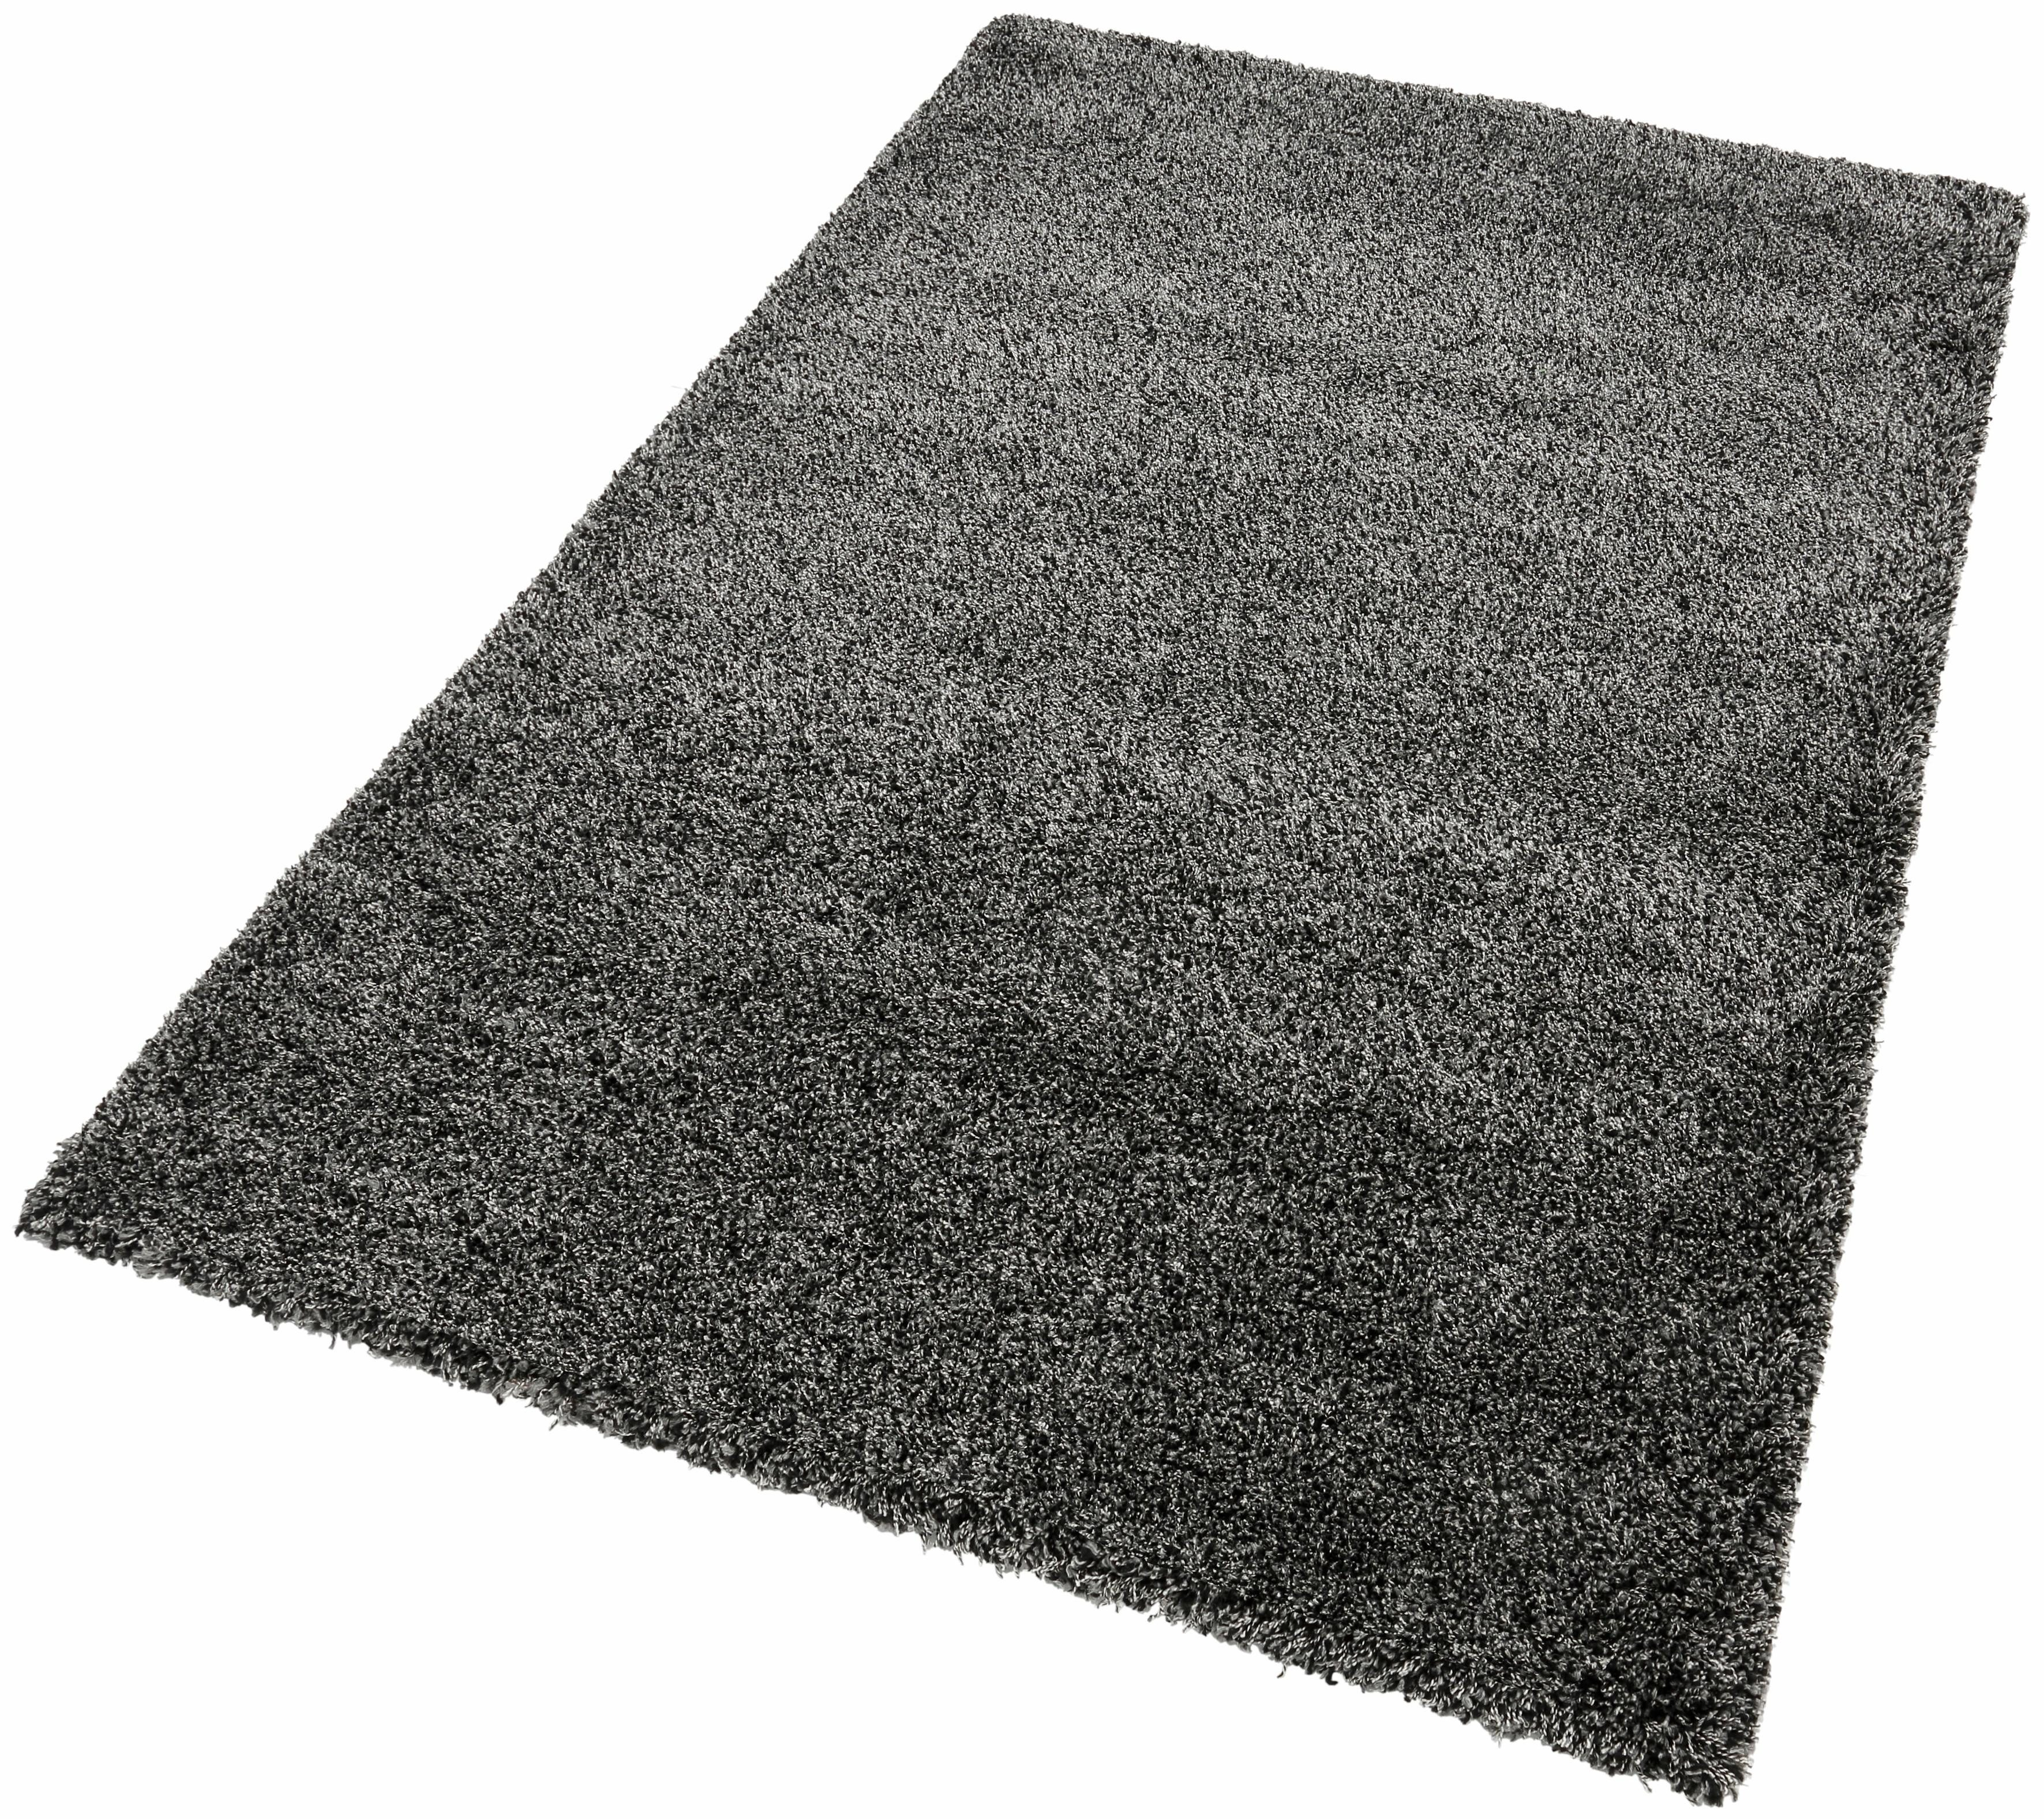 Hochflor-Teppich INDRE merinos rechteckig Höhe 50 mm maschinell gewebt